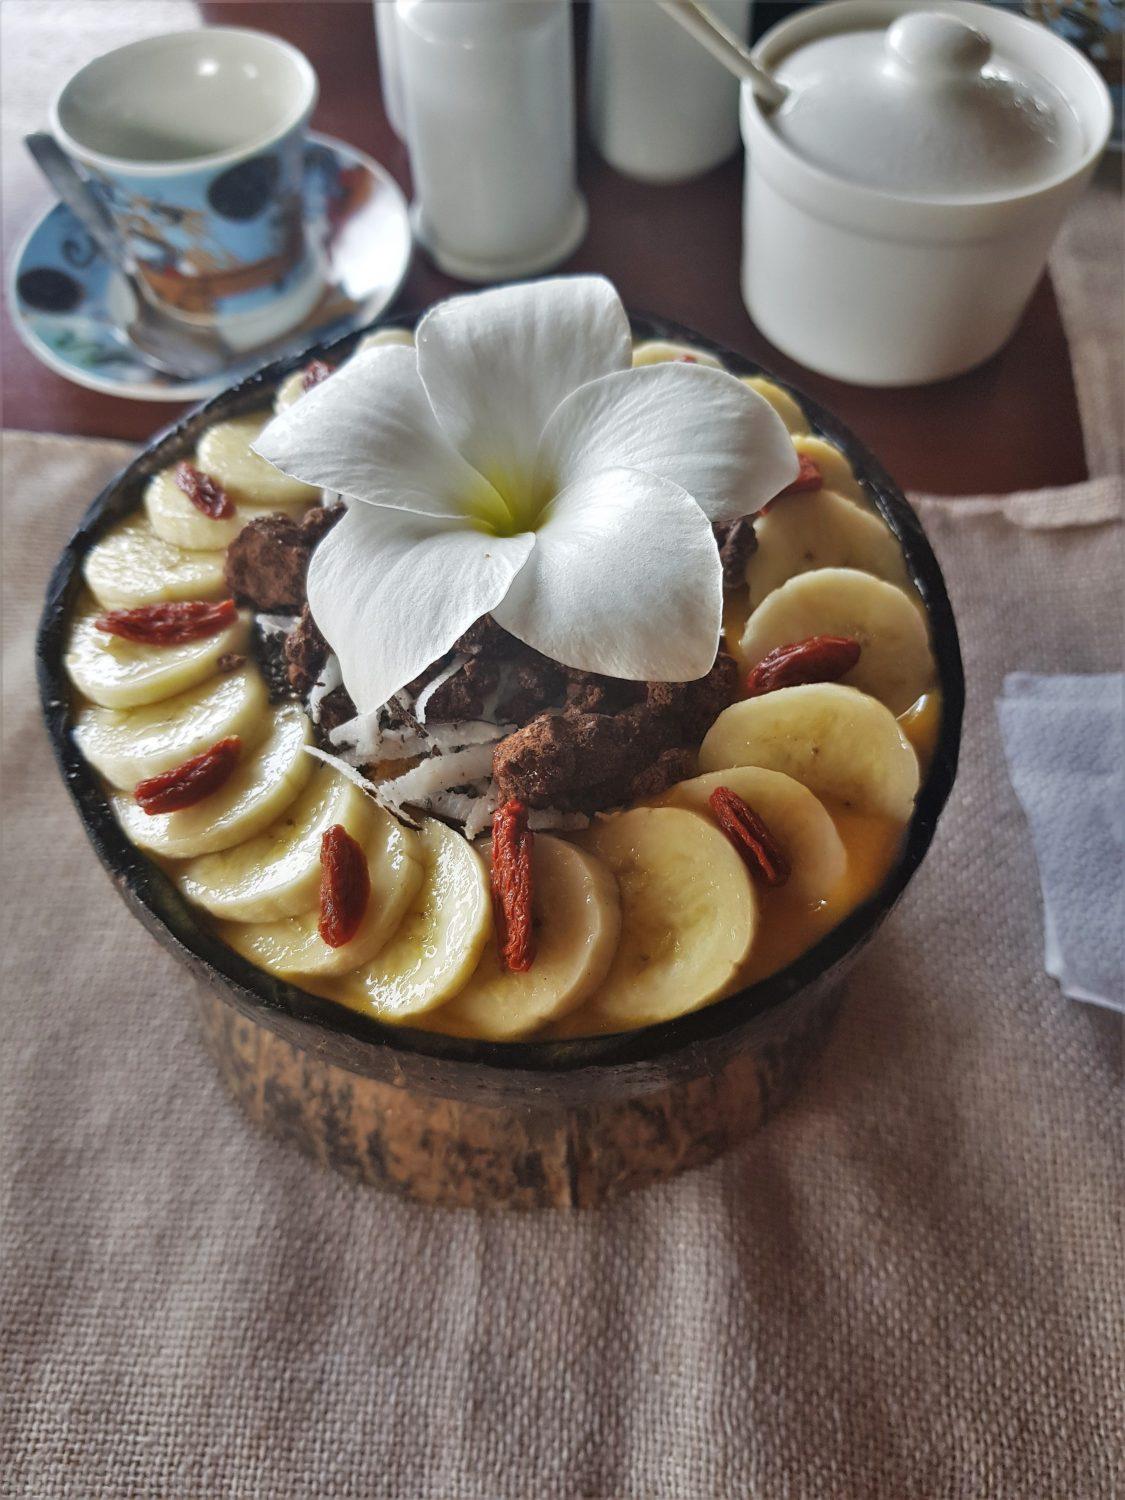 Siqijor smoothiebowl